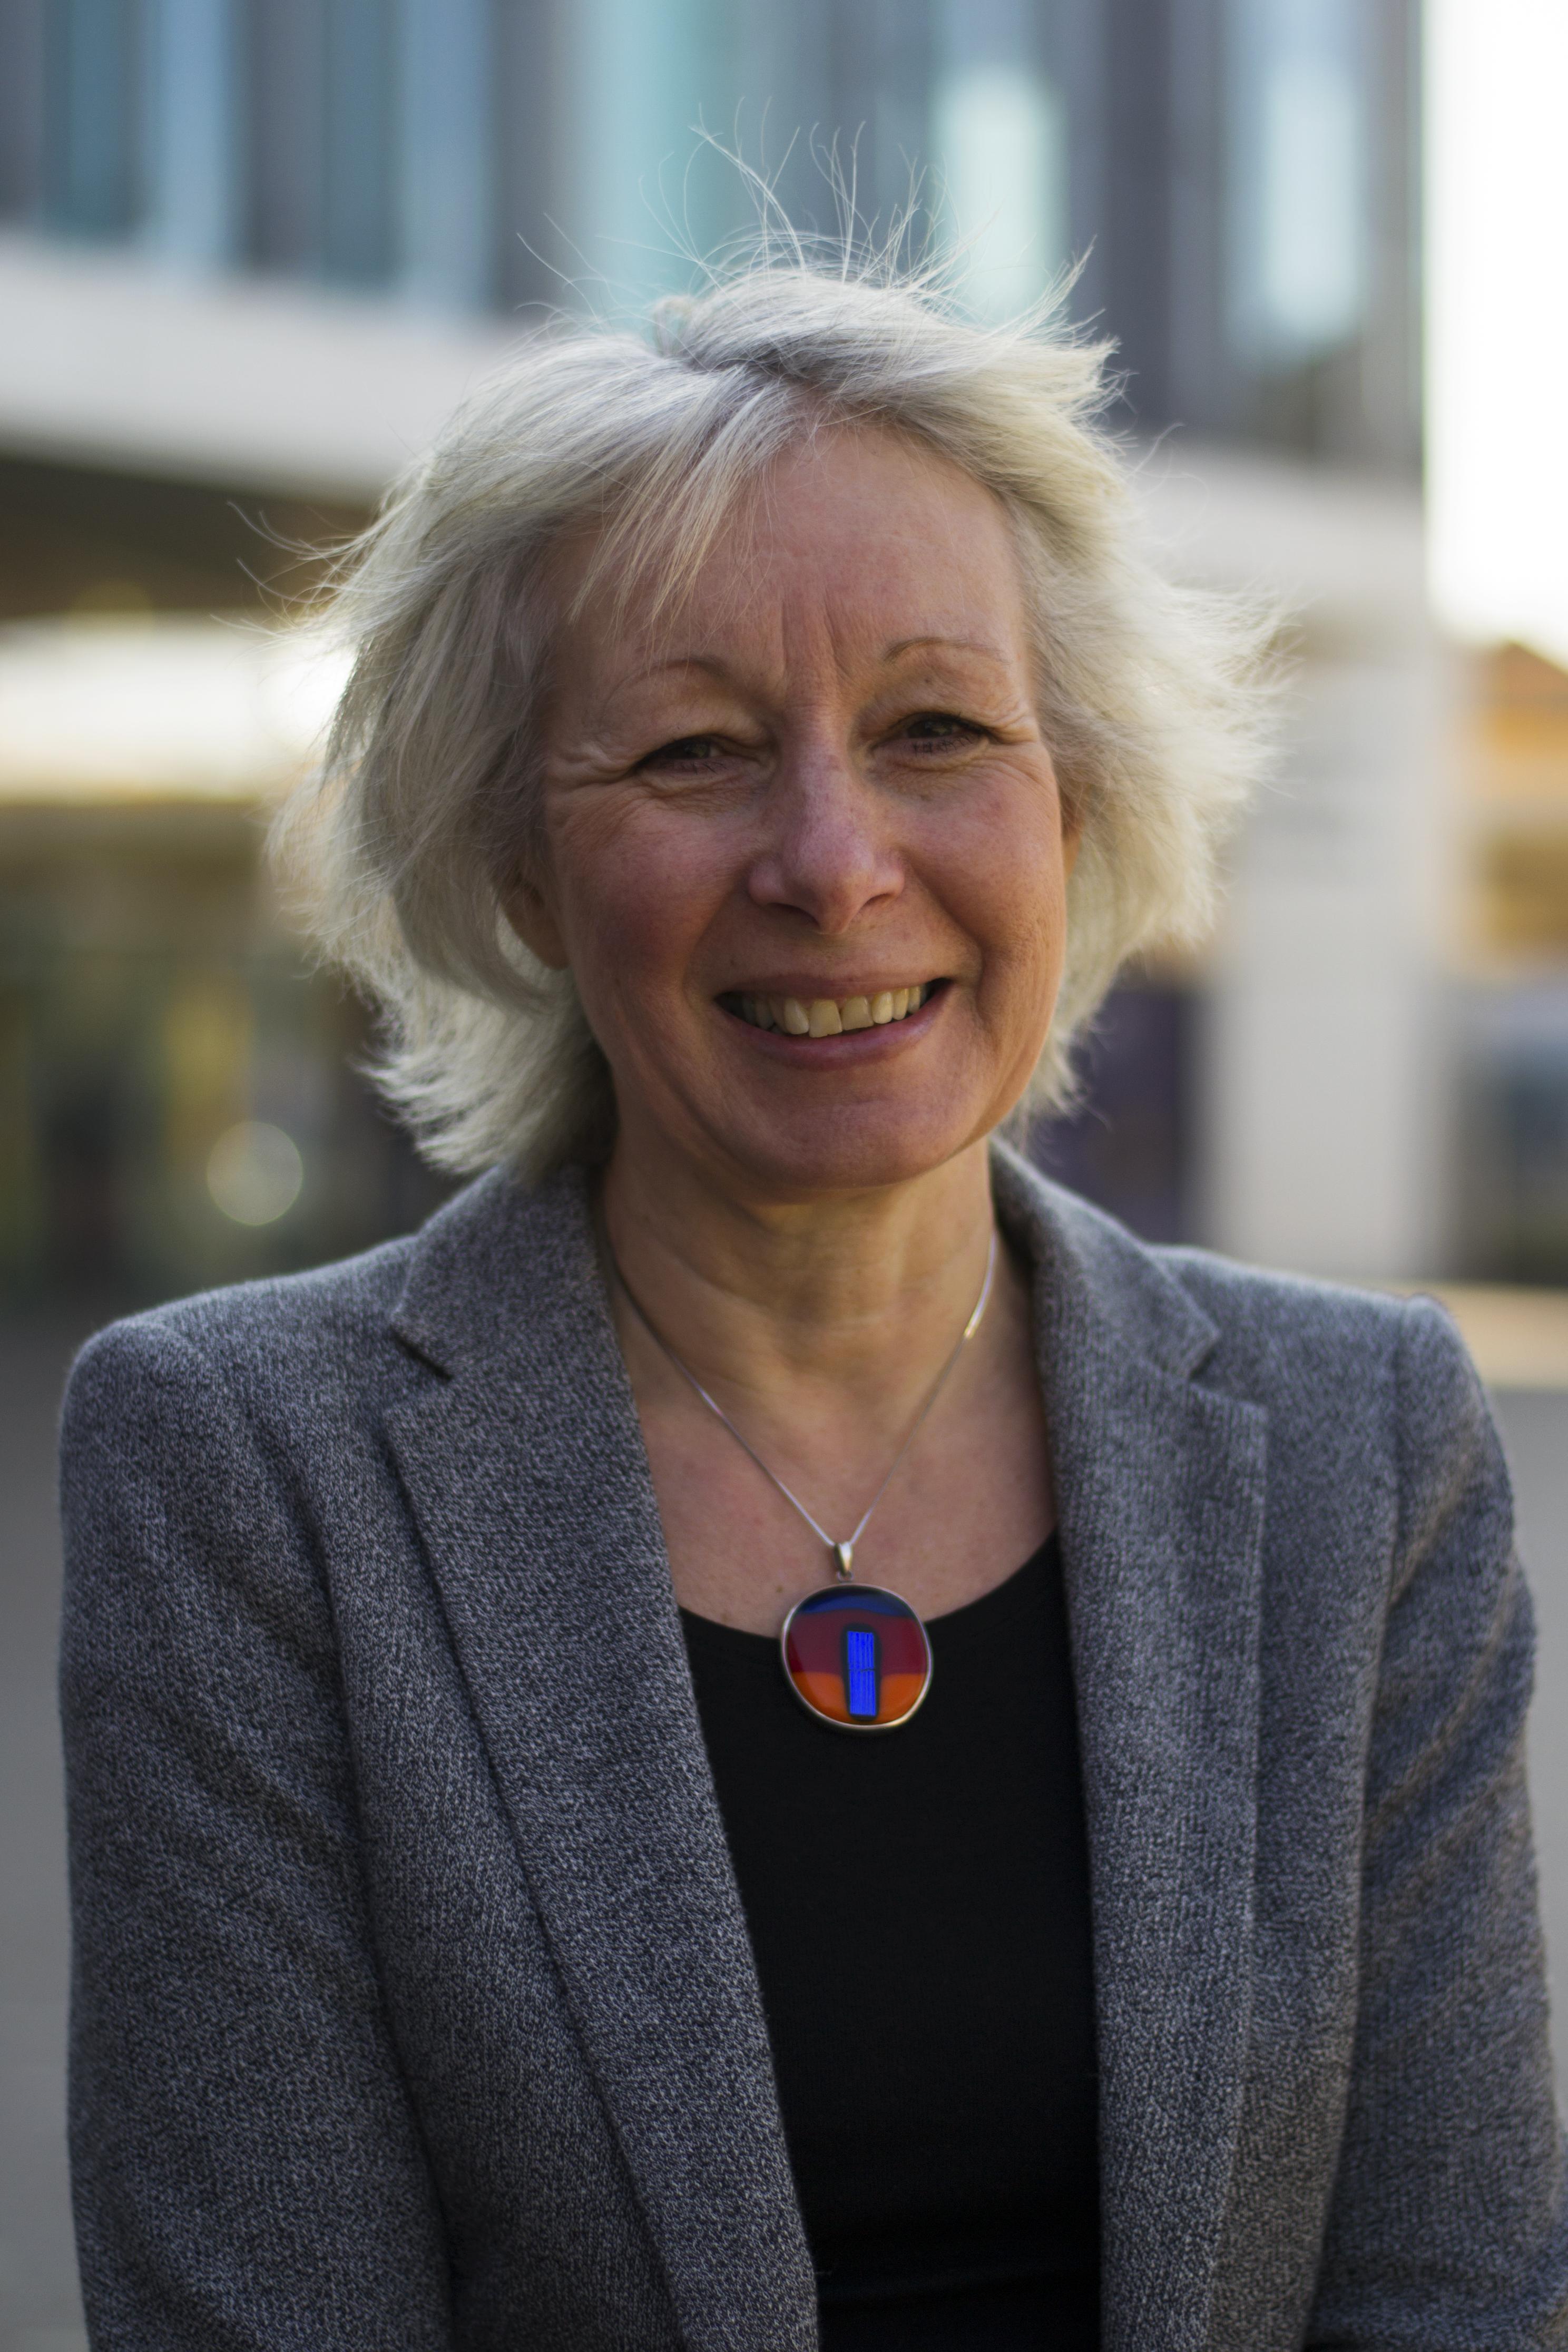 June-Tilbury-Labour-Party-Addlestone.jpg